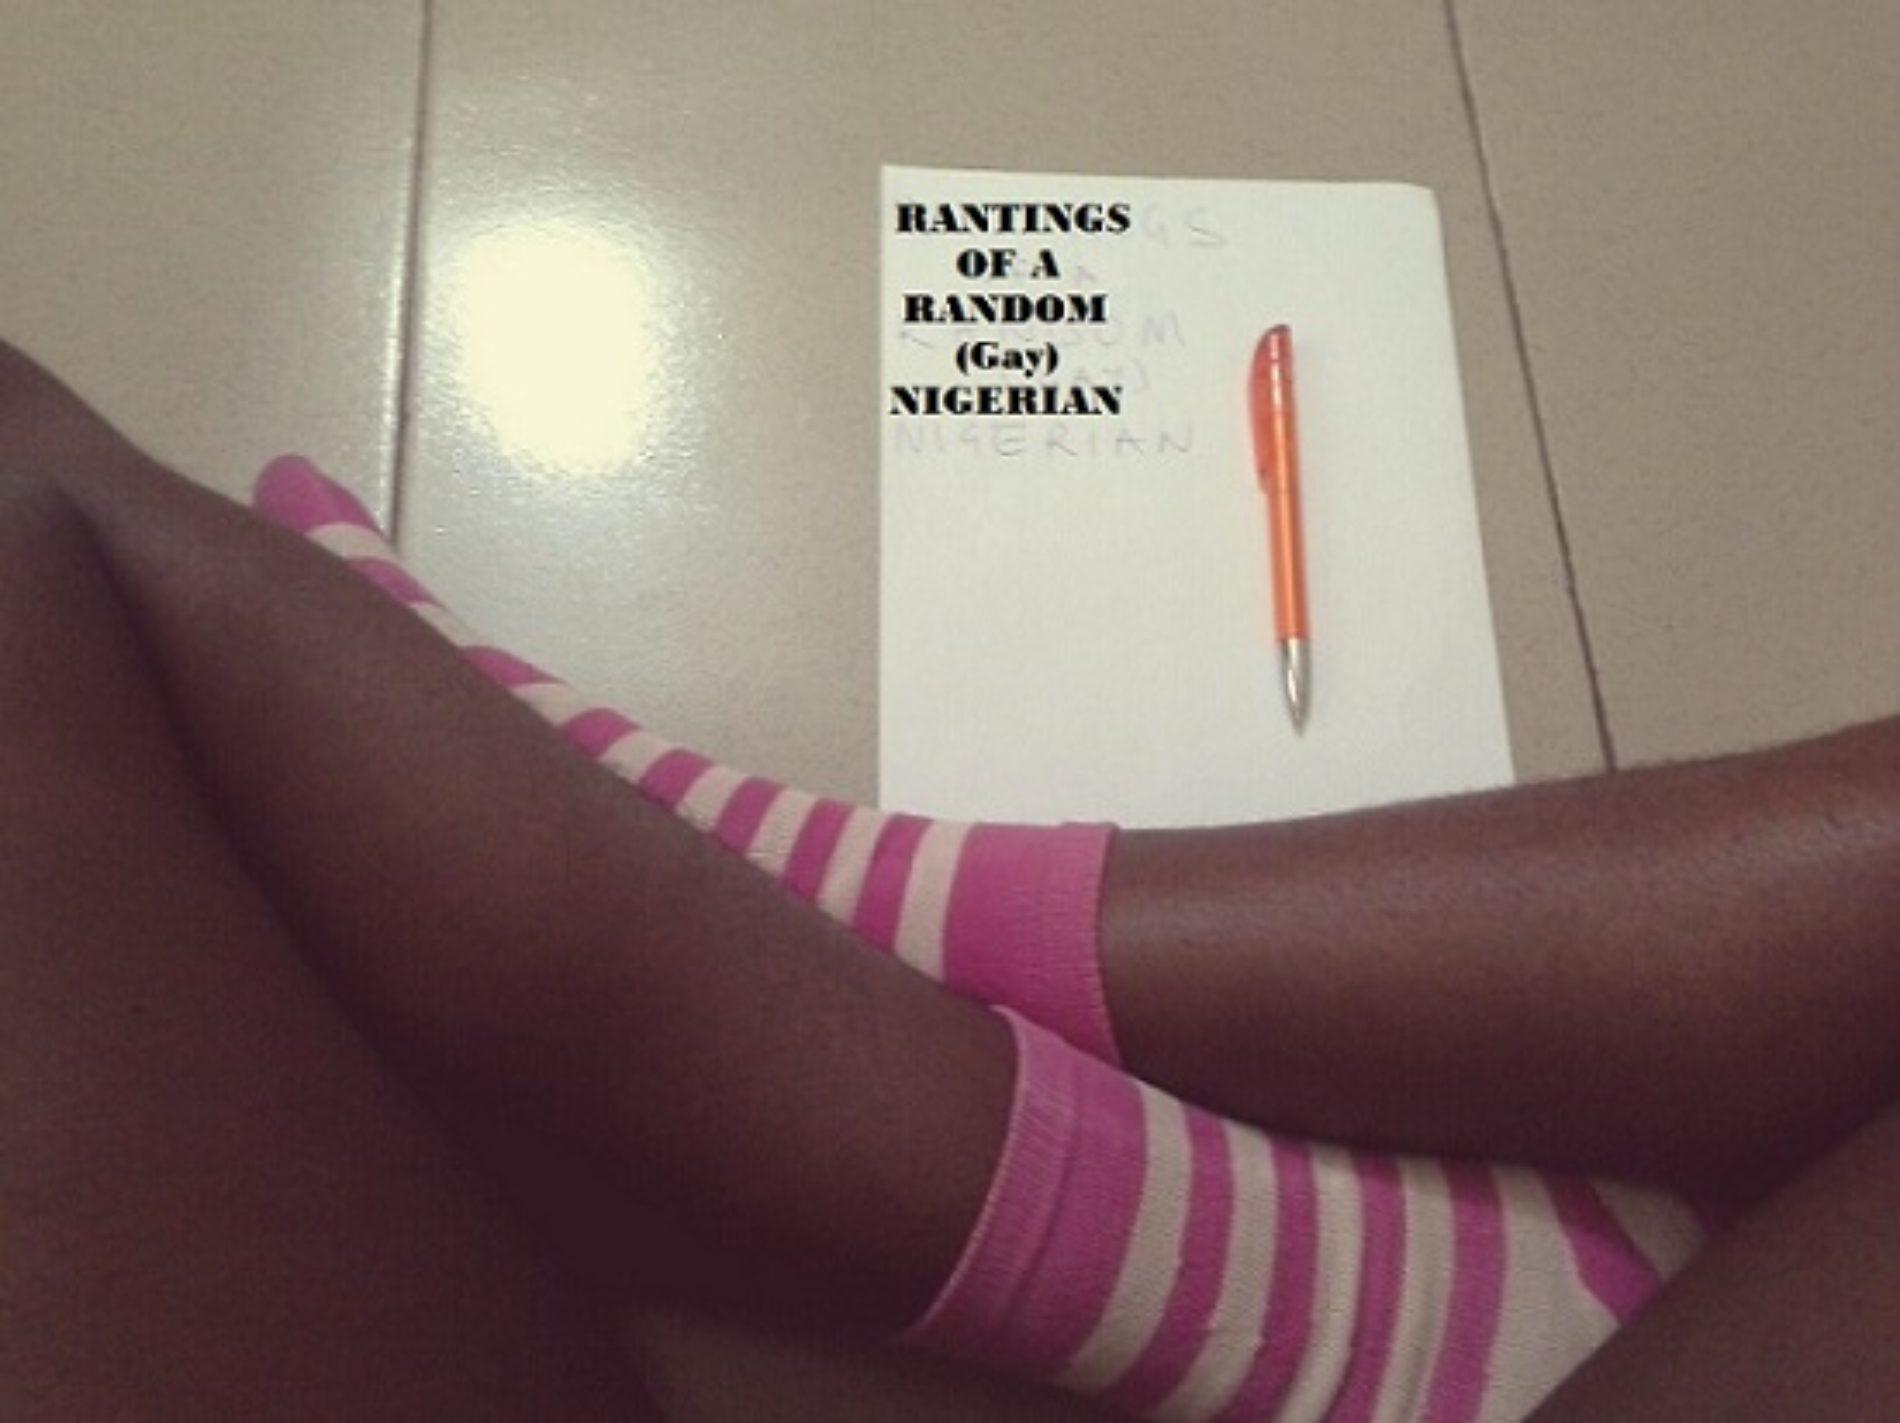 RANTINGS OF A RANDOM (Gay) NIGERIAN (Entry 22)